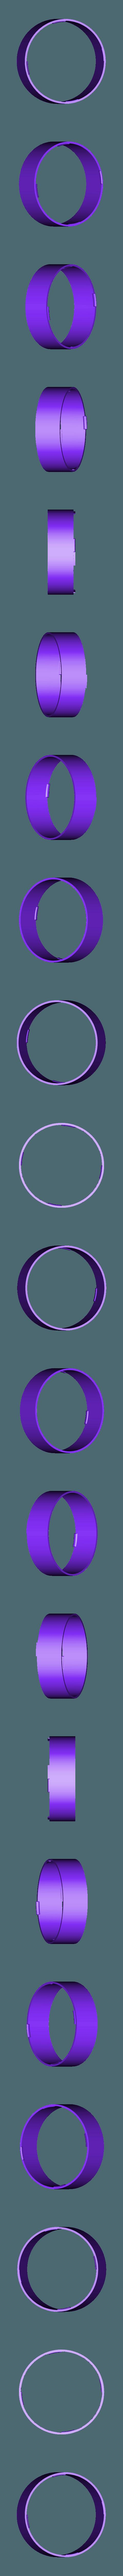 Pipe.stl Download free STL file air pipe cover (inner diameter of the pipe = 100 mm) • 3D printer model, kleinerELM